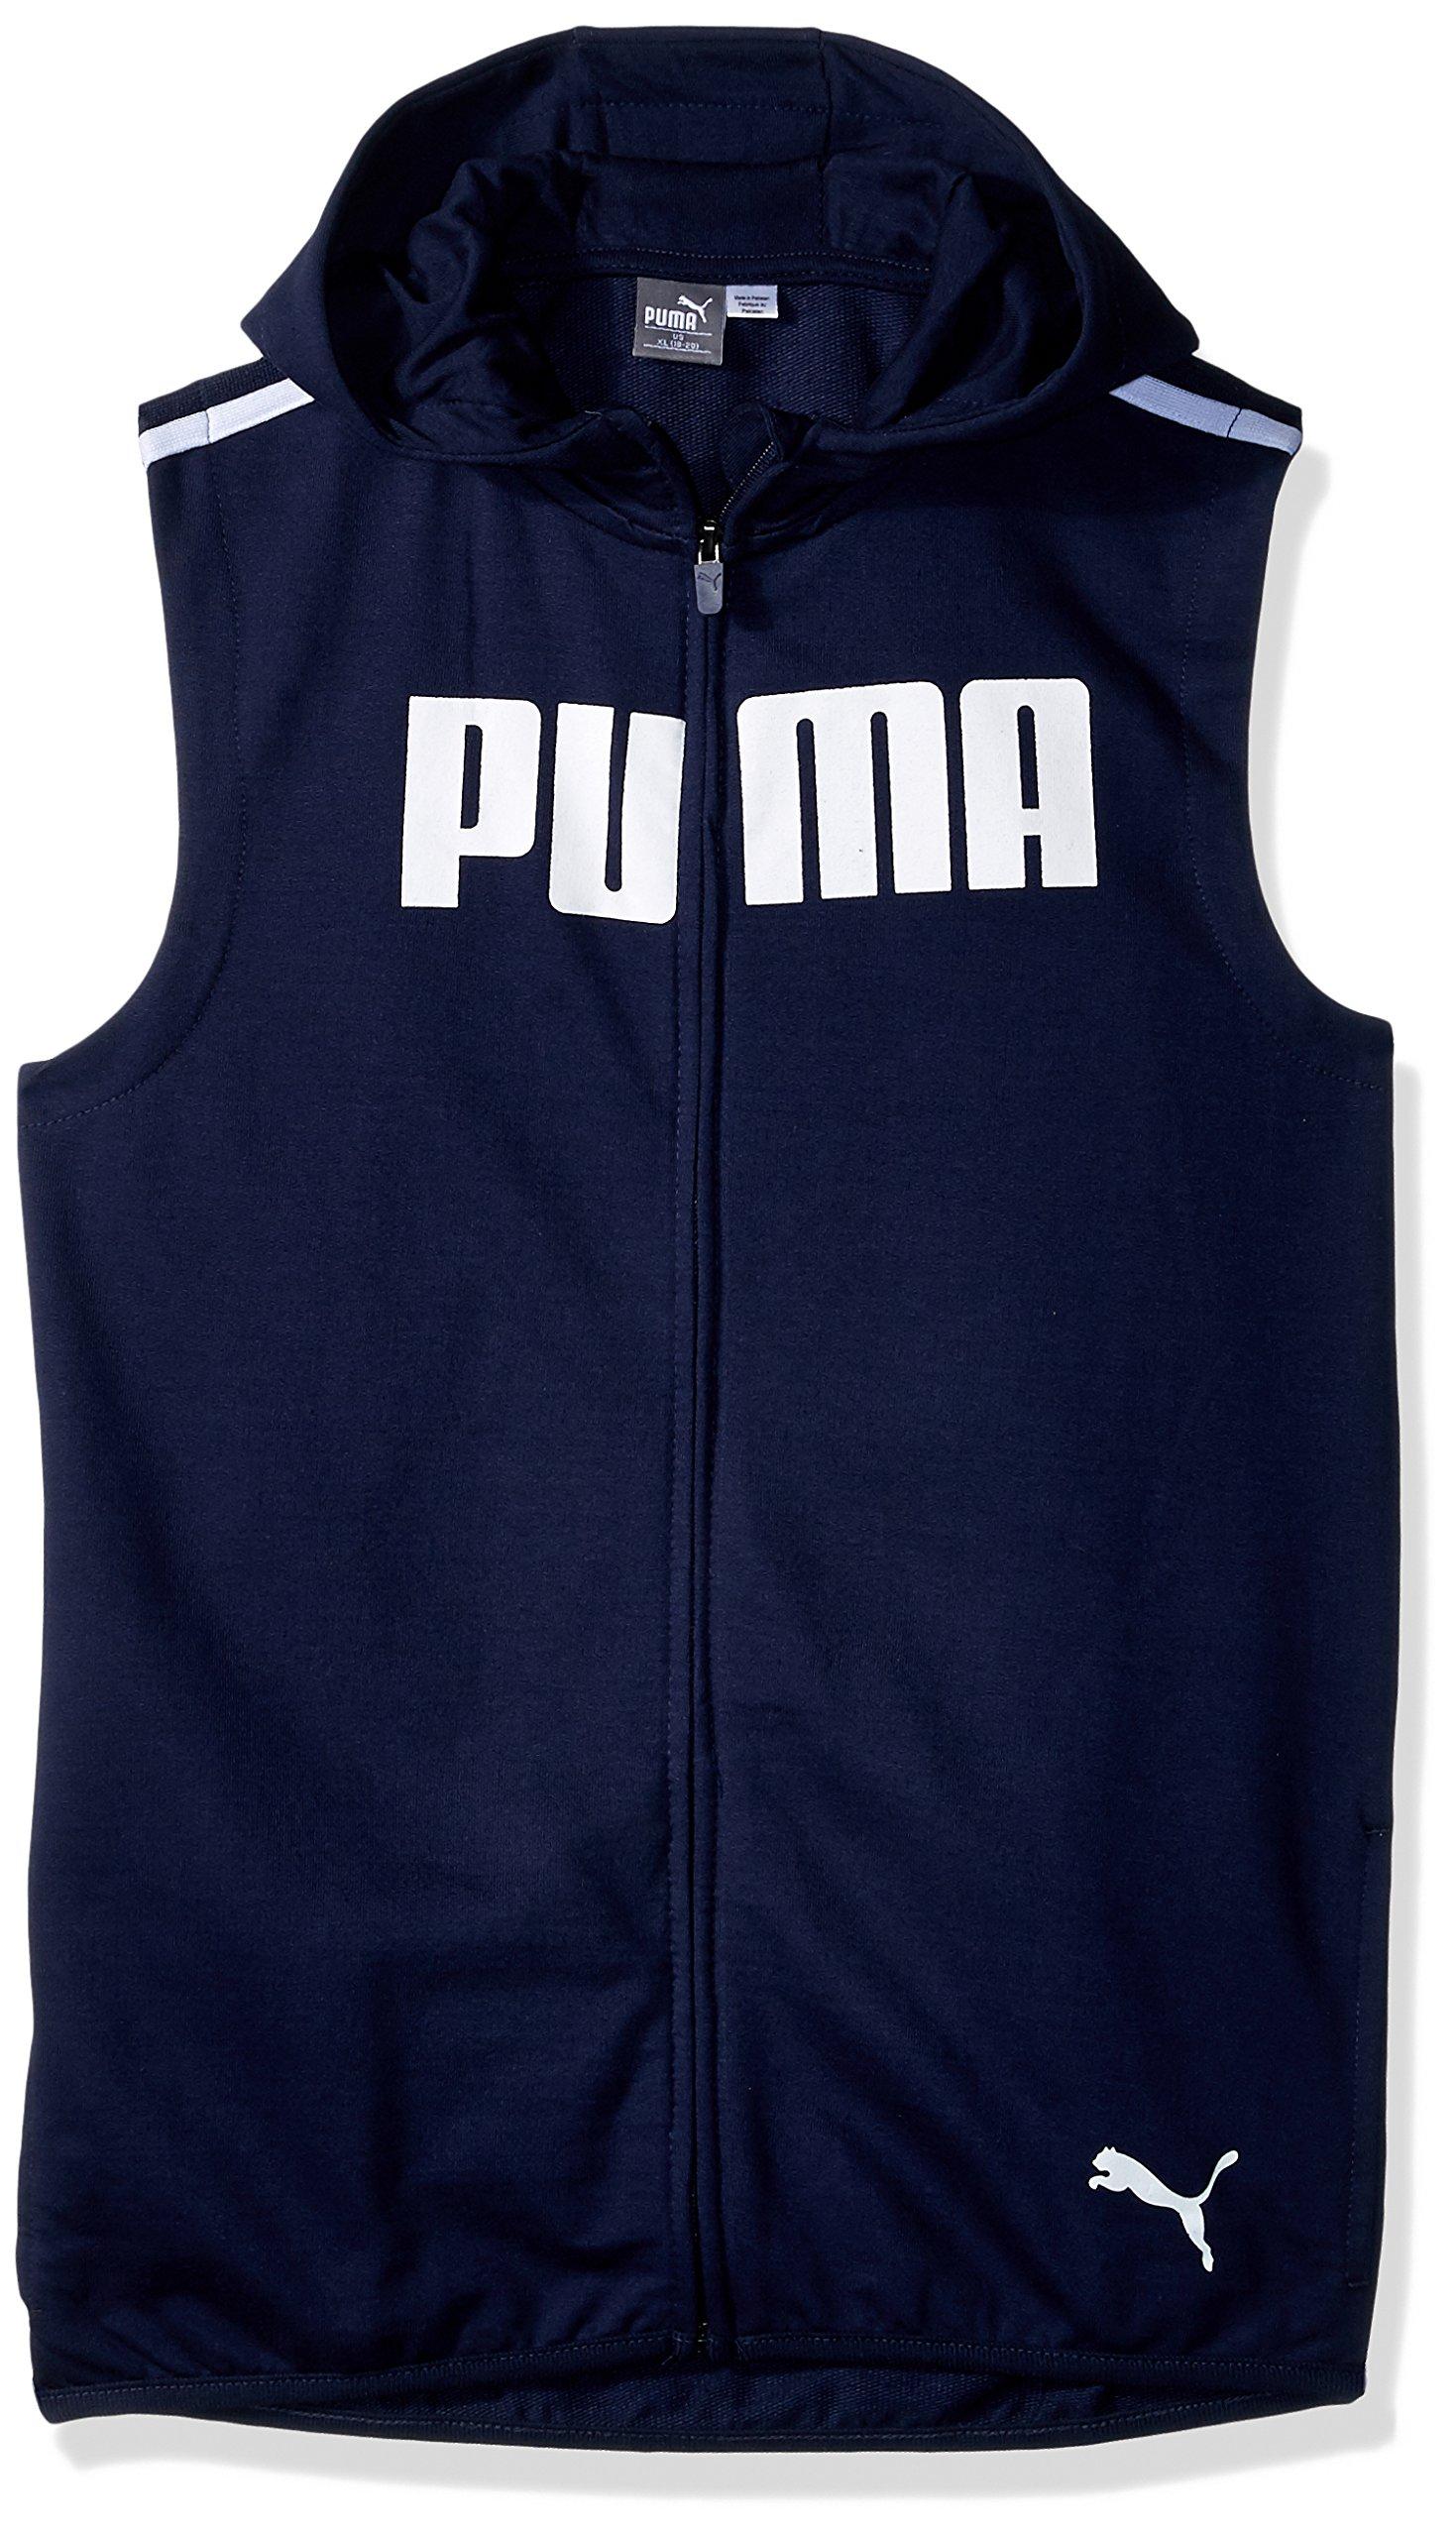 PUMA Toddler Boys' Dimicco Full Zip Hooded Vest, Peacot, 2T